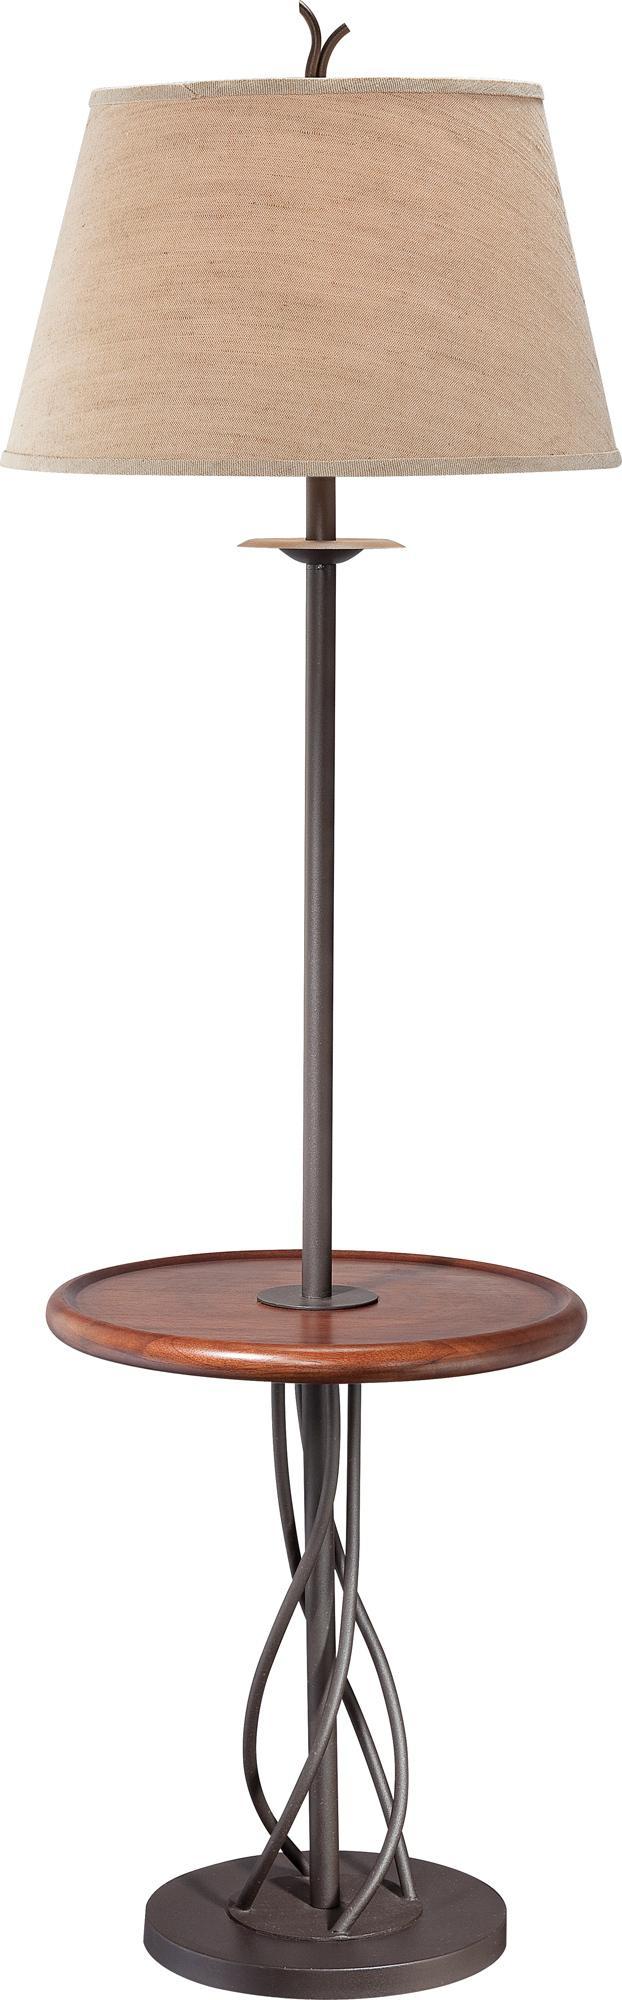 Iron Twist Base Wood Tray Table Floor Lamp N5774 Lamps Plus Madera L 225 Mparas De Pie Hierro